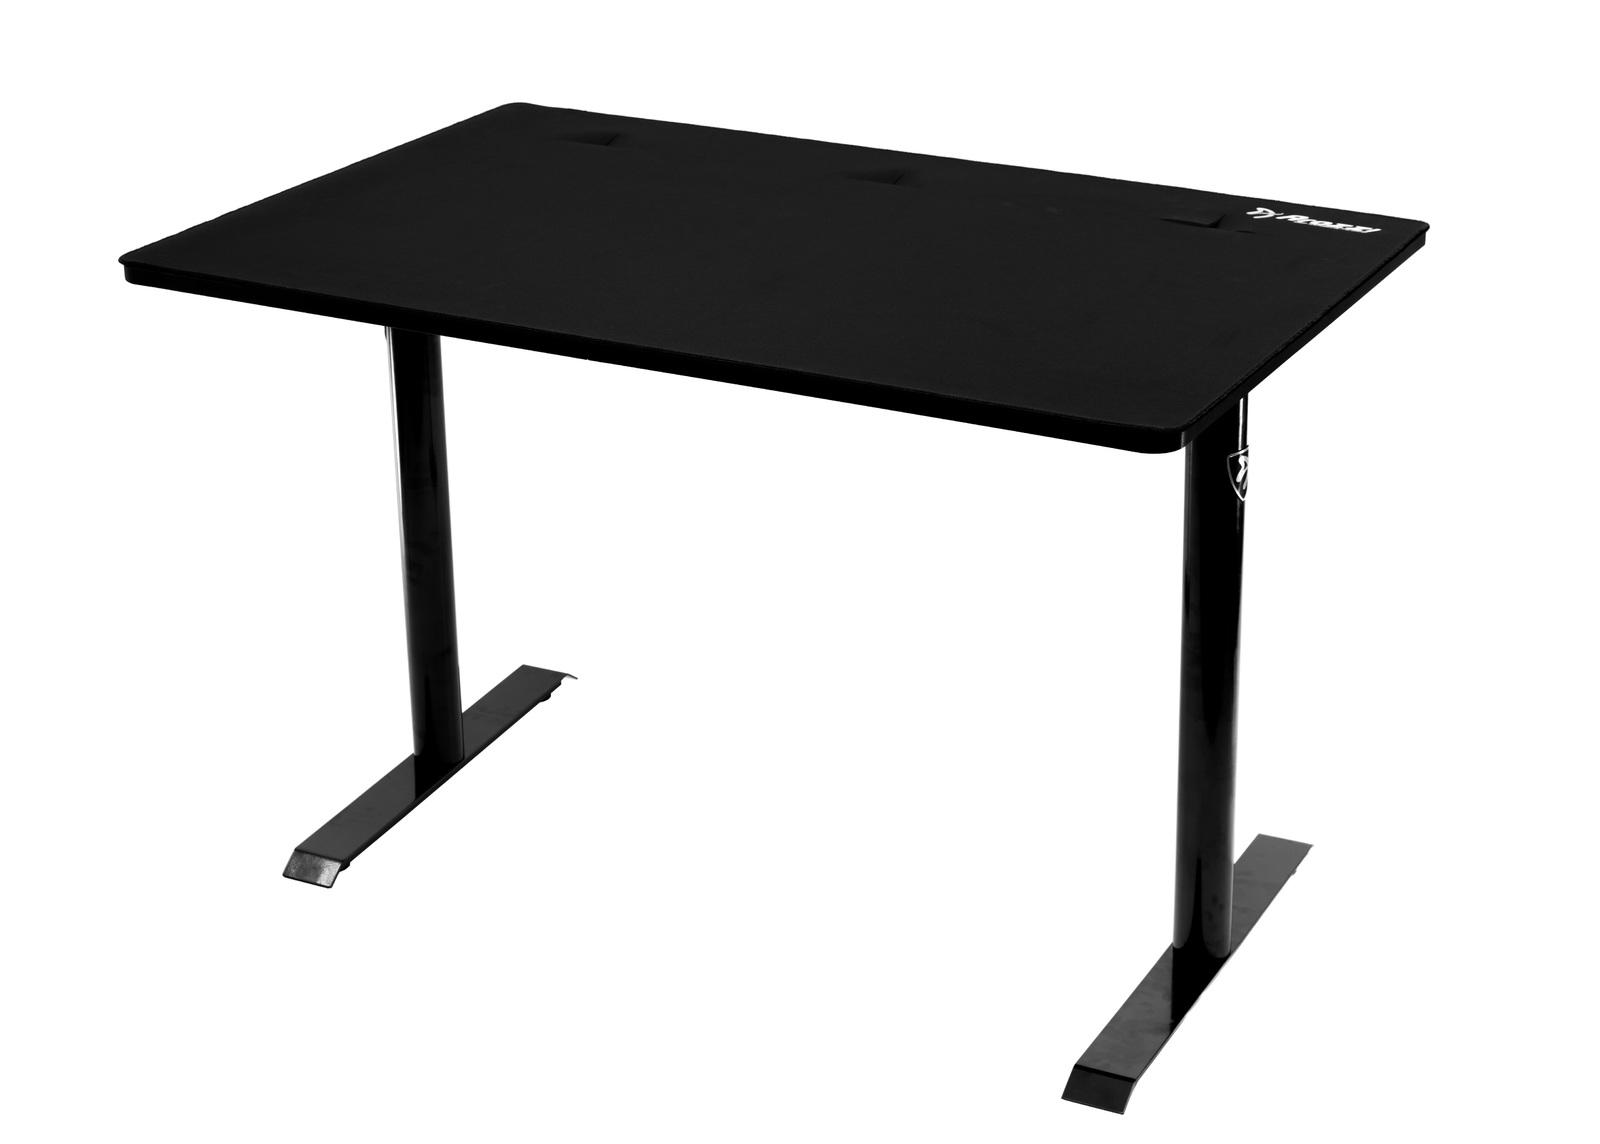 Arozzi Arena Leggero Gaming Desk (Black) image